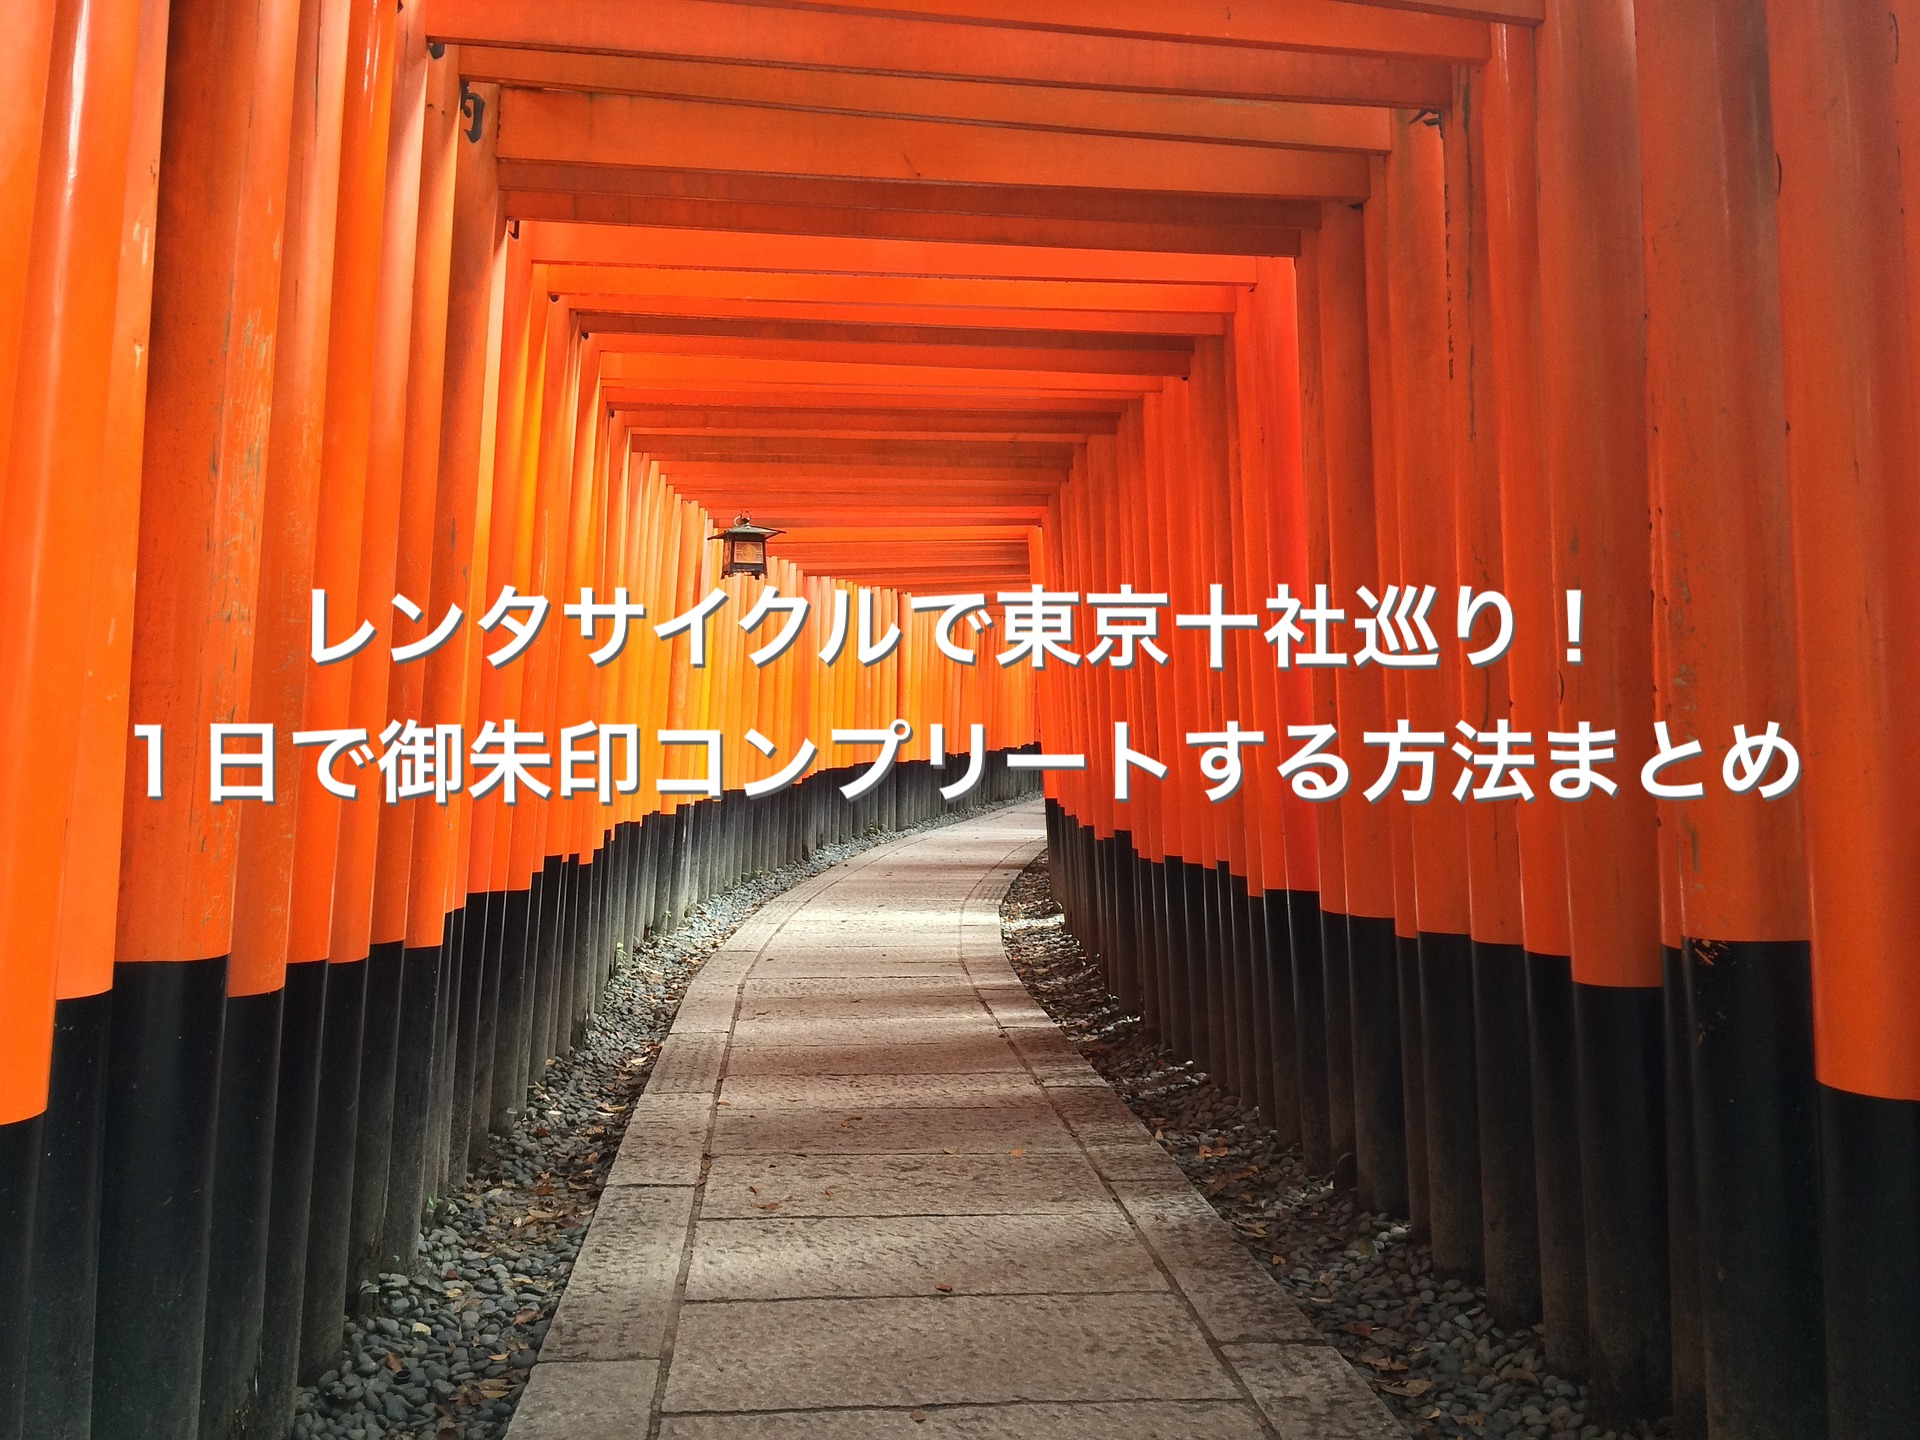 special_tokyo10jinja